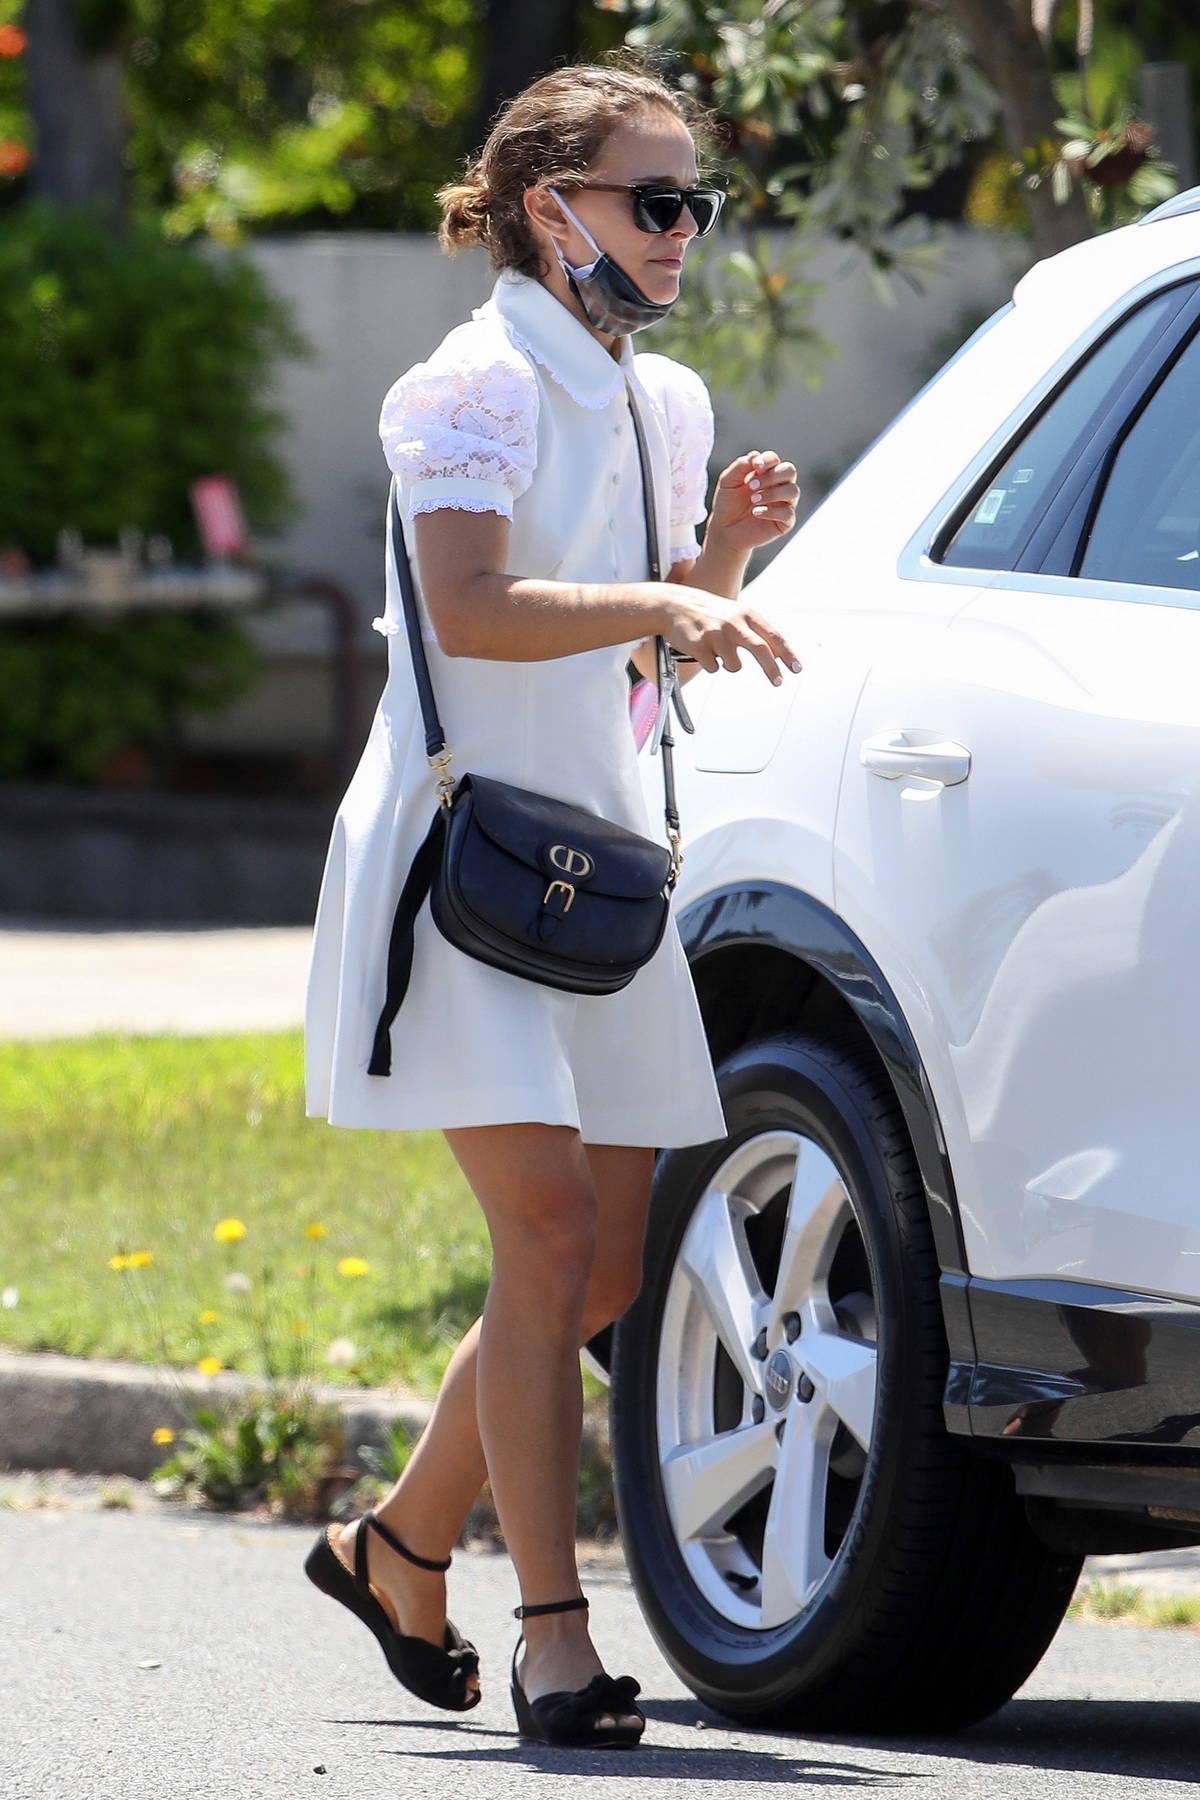 Natalie Portman seen wearing a lovely white dress while visitinga nail salon in Sydney, Australia